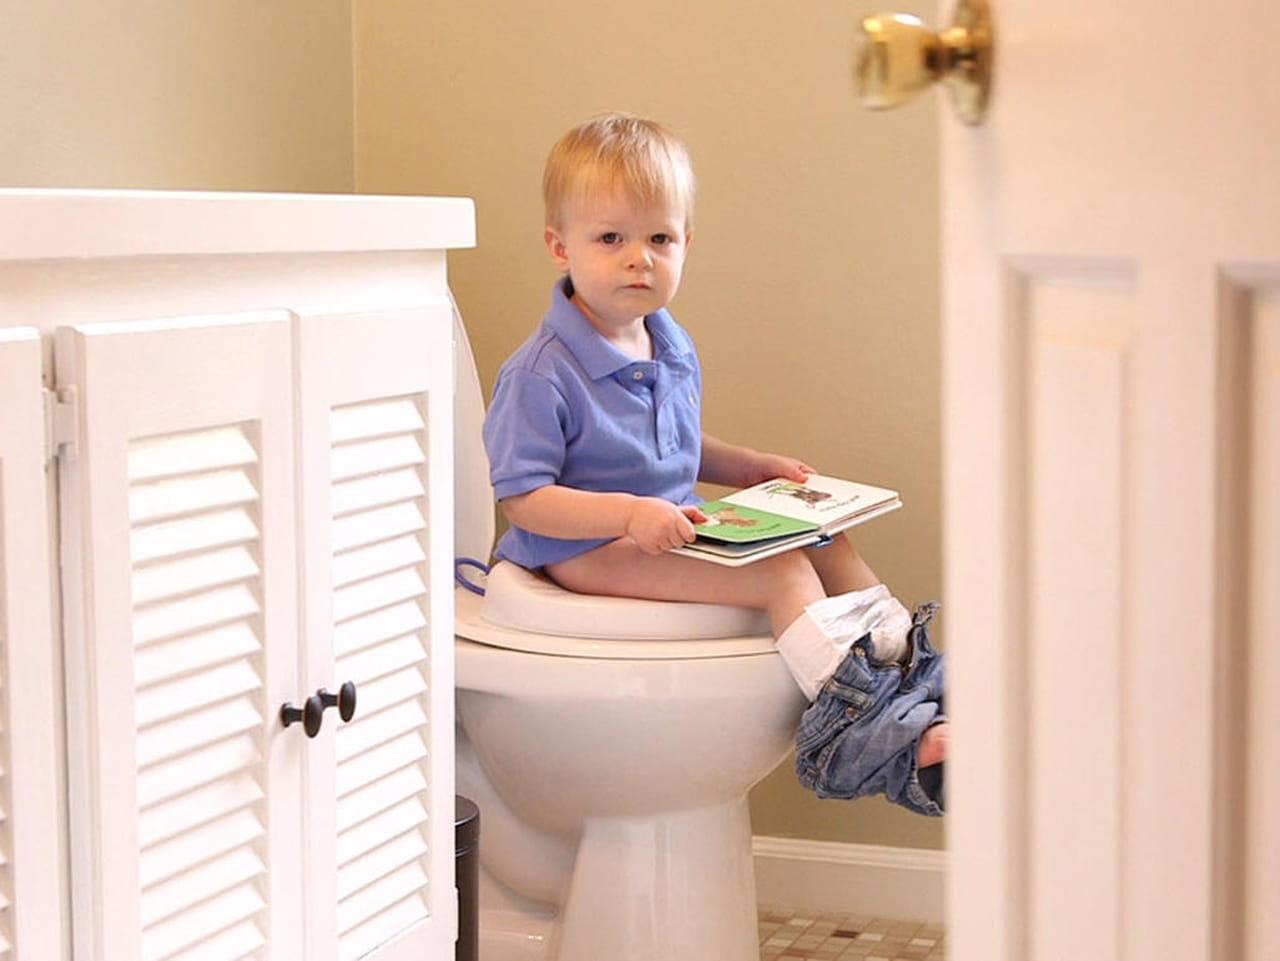 Ha peeing potty toilet - Nude pics